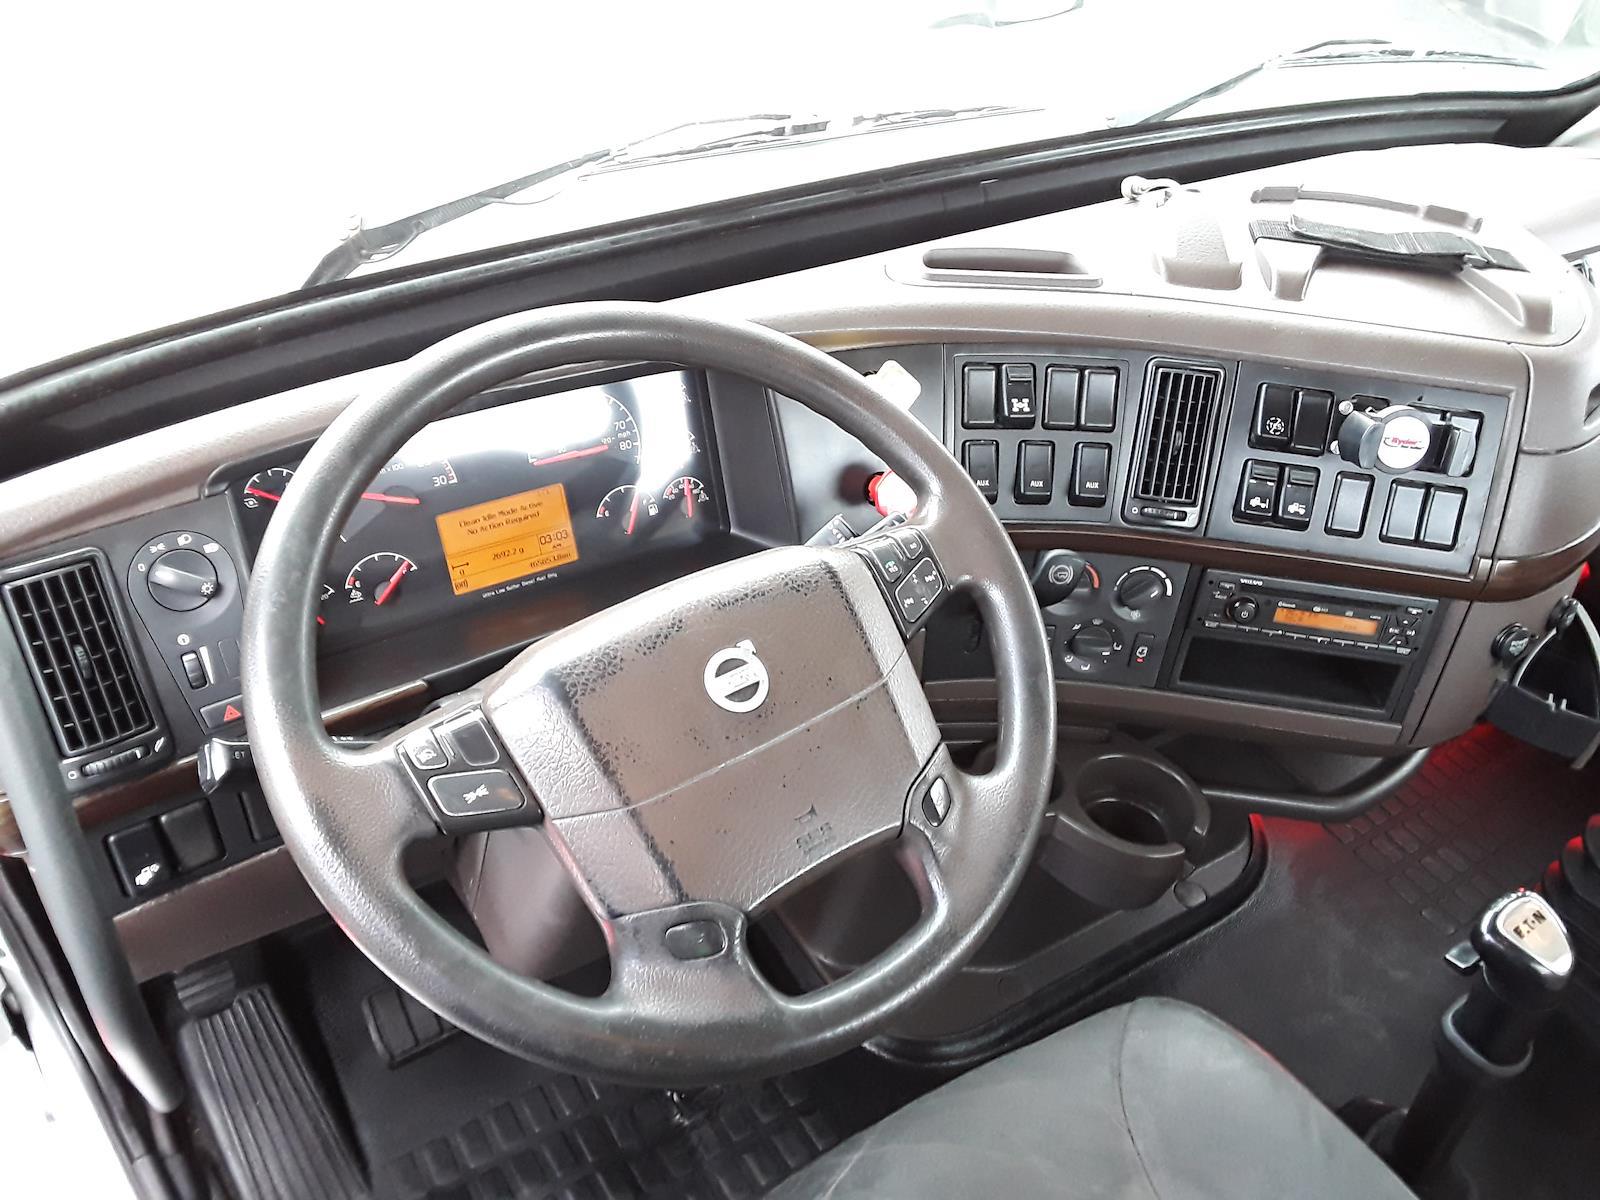 2014 Volvo VNL 6x4, Tractor #539013 - photo 1